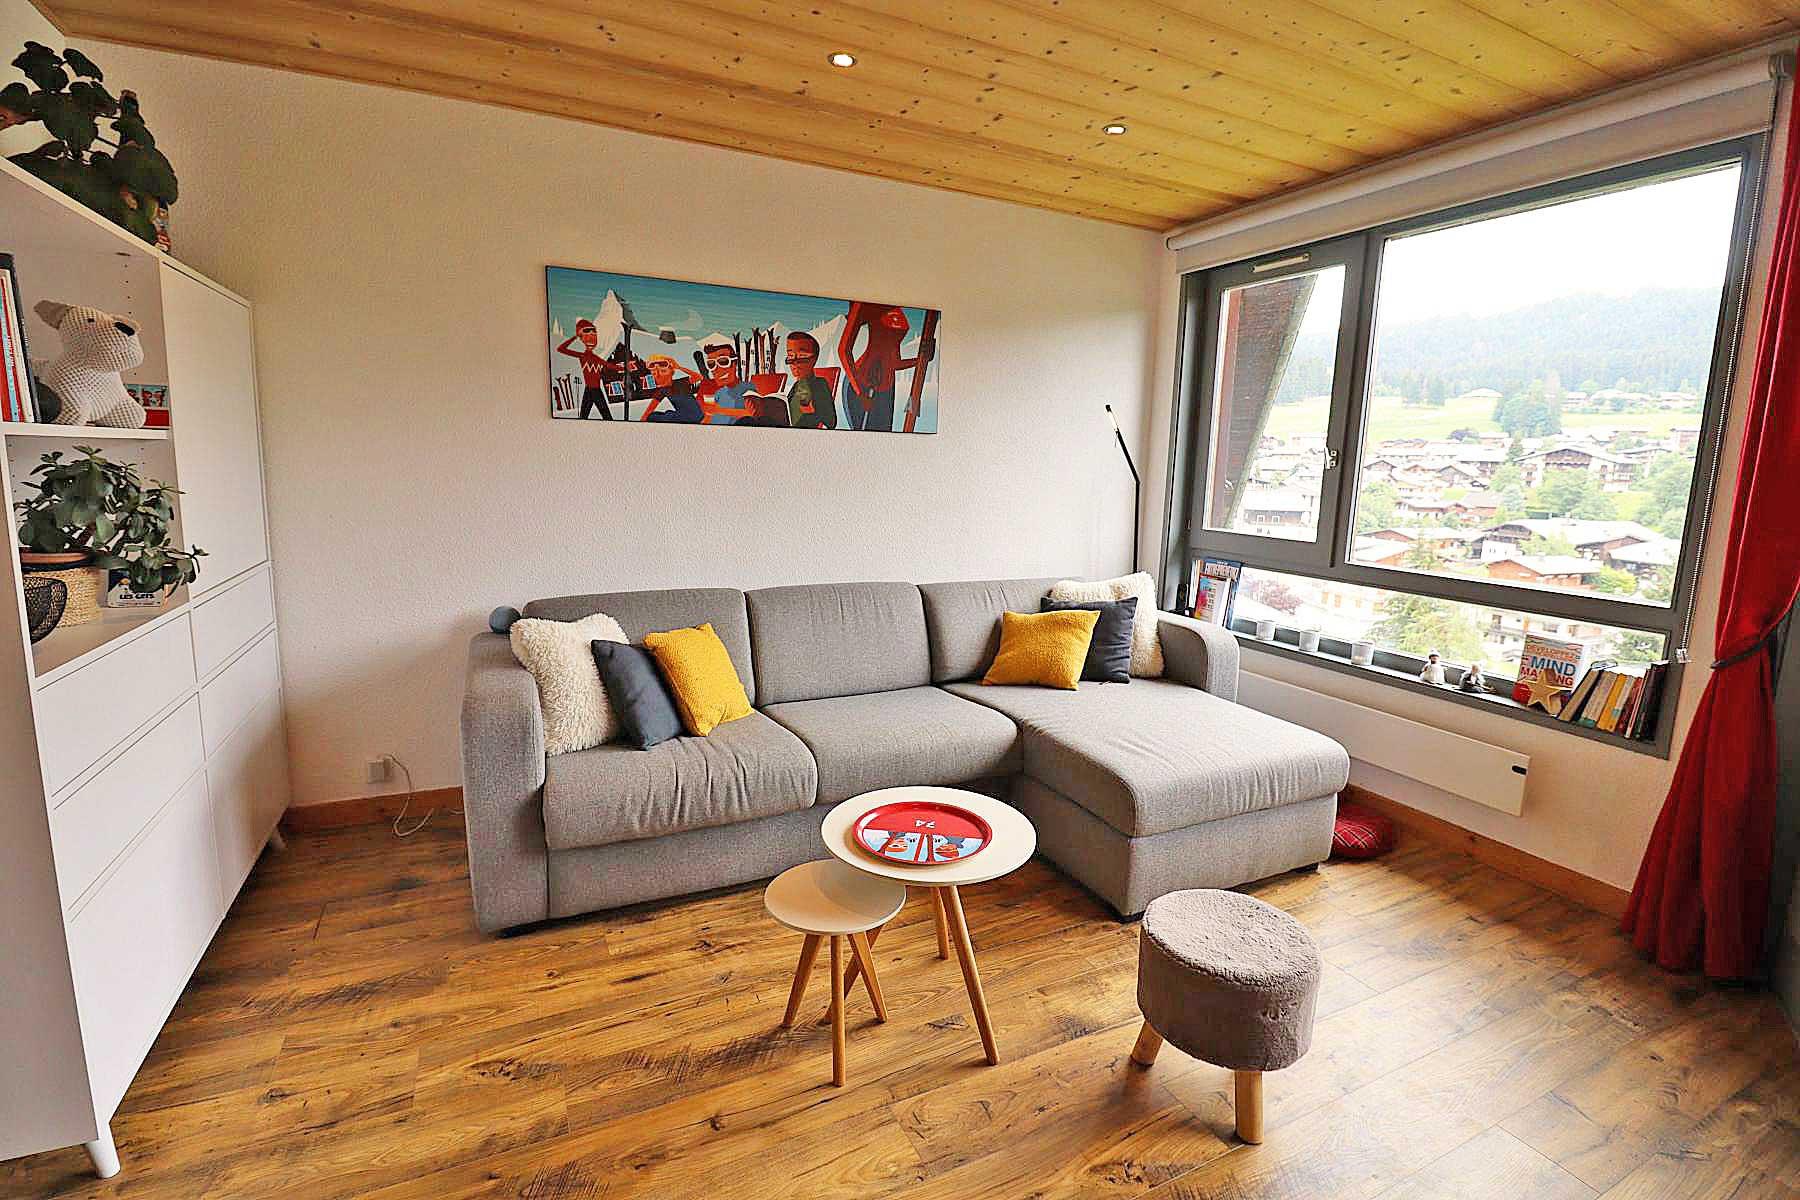 Duplex Clos Appt 821 Lounge